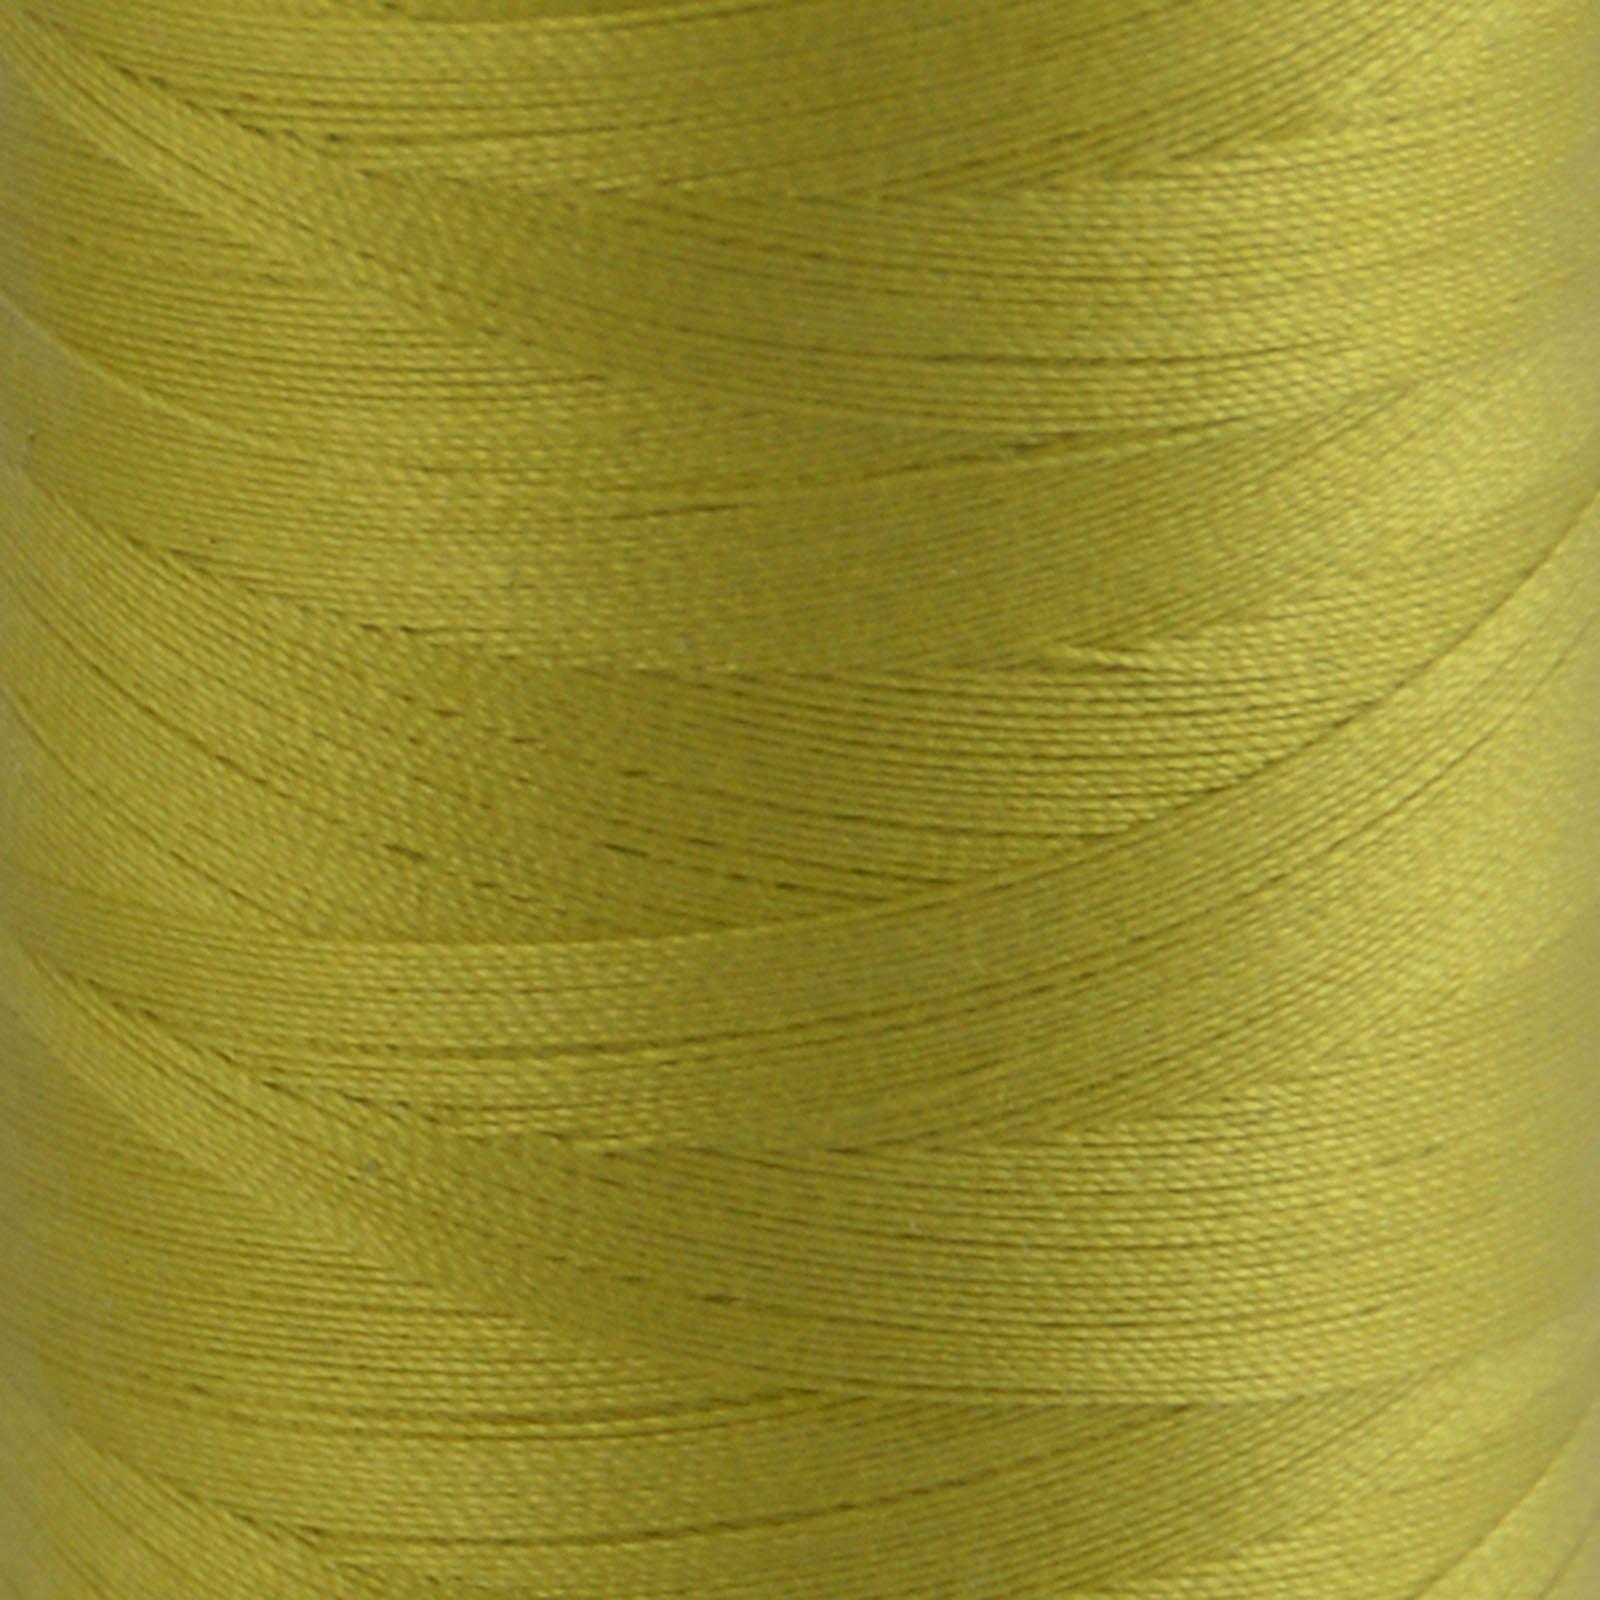 # 5015 Gold Yellow